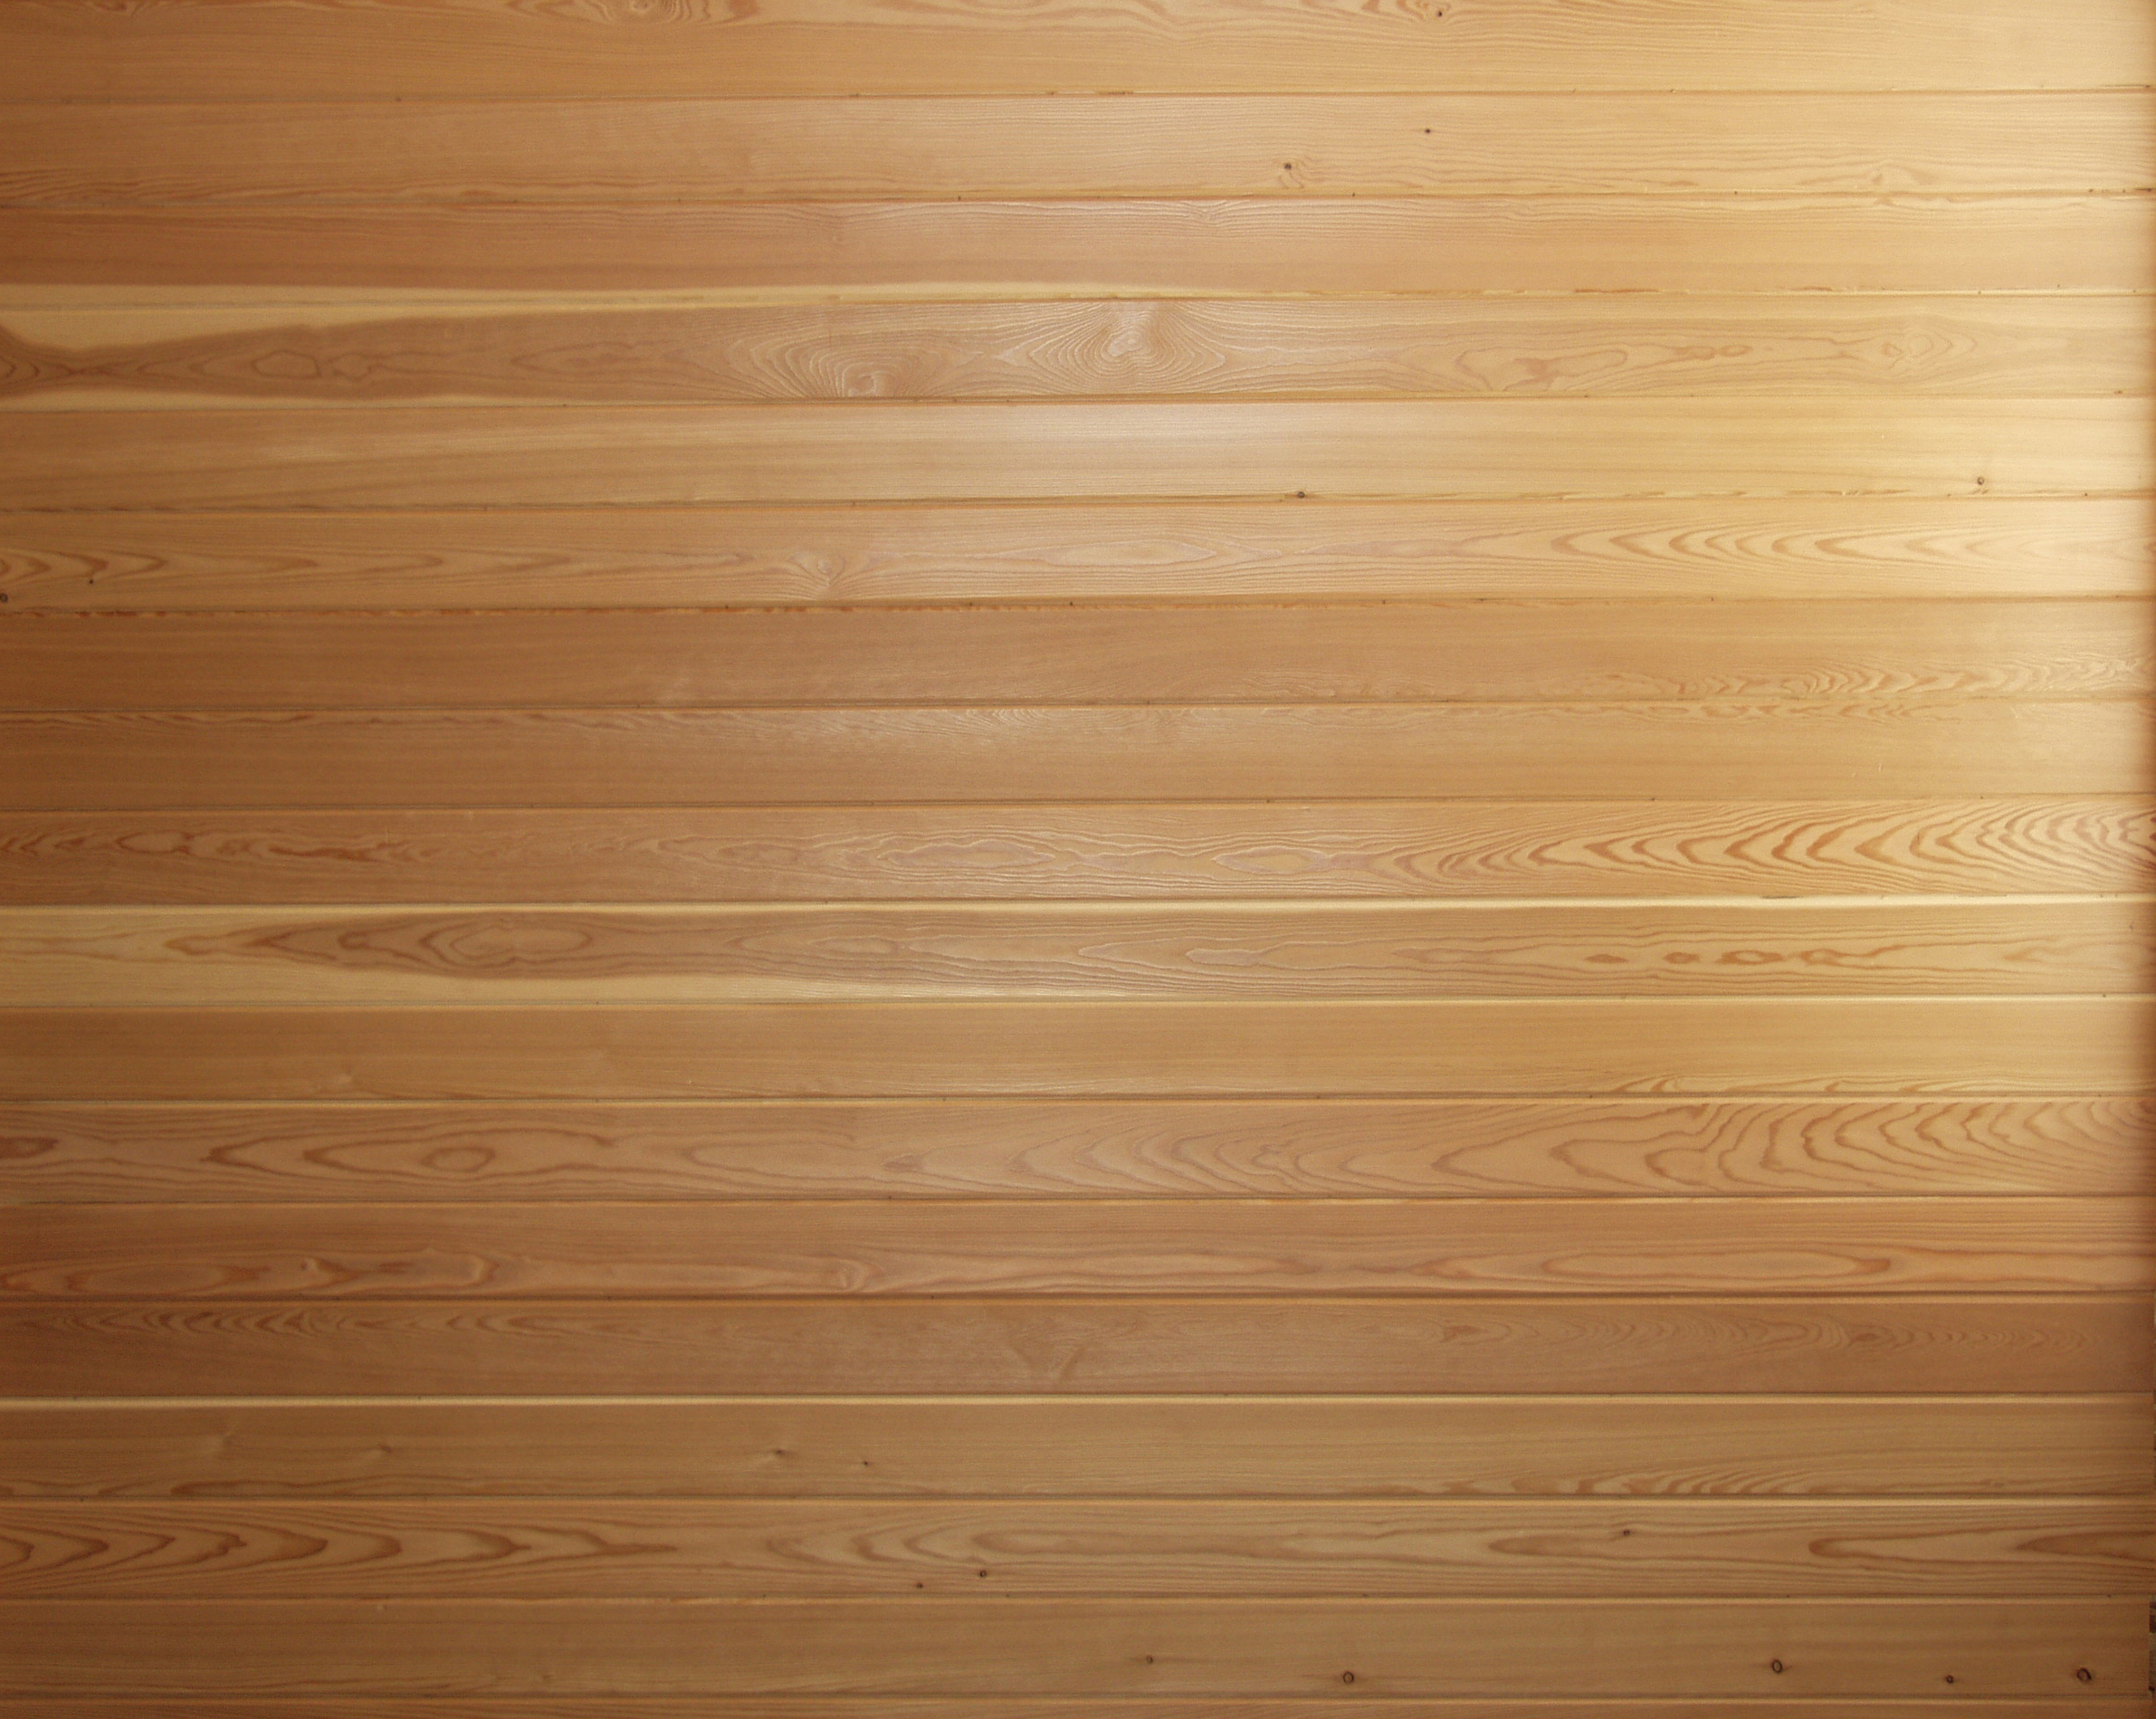 Bear Creek Lumber Douglas Fir Larch Paneling And Patterns